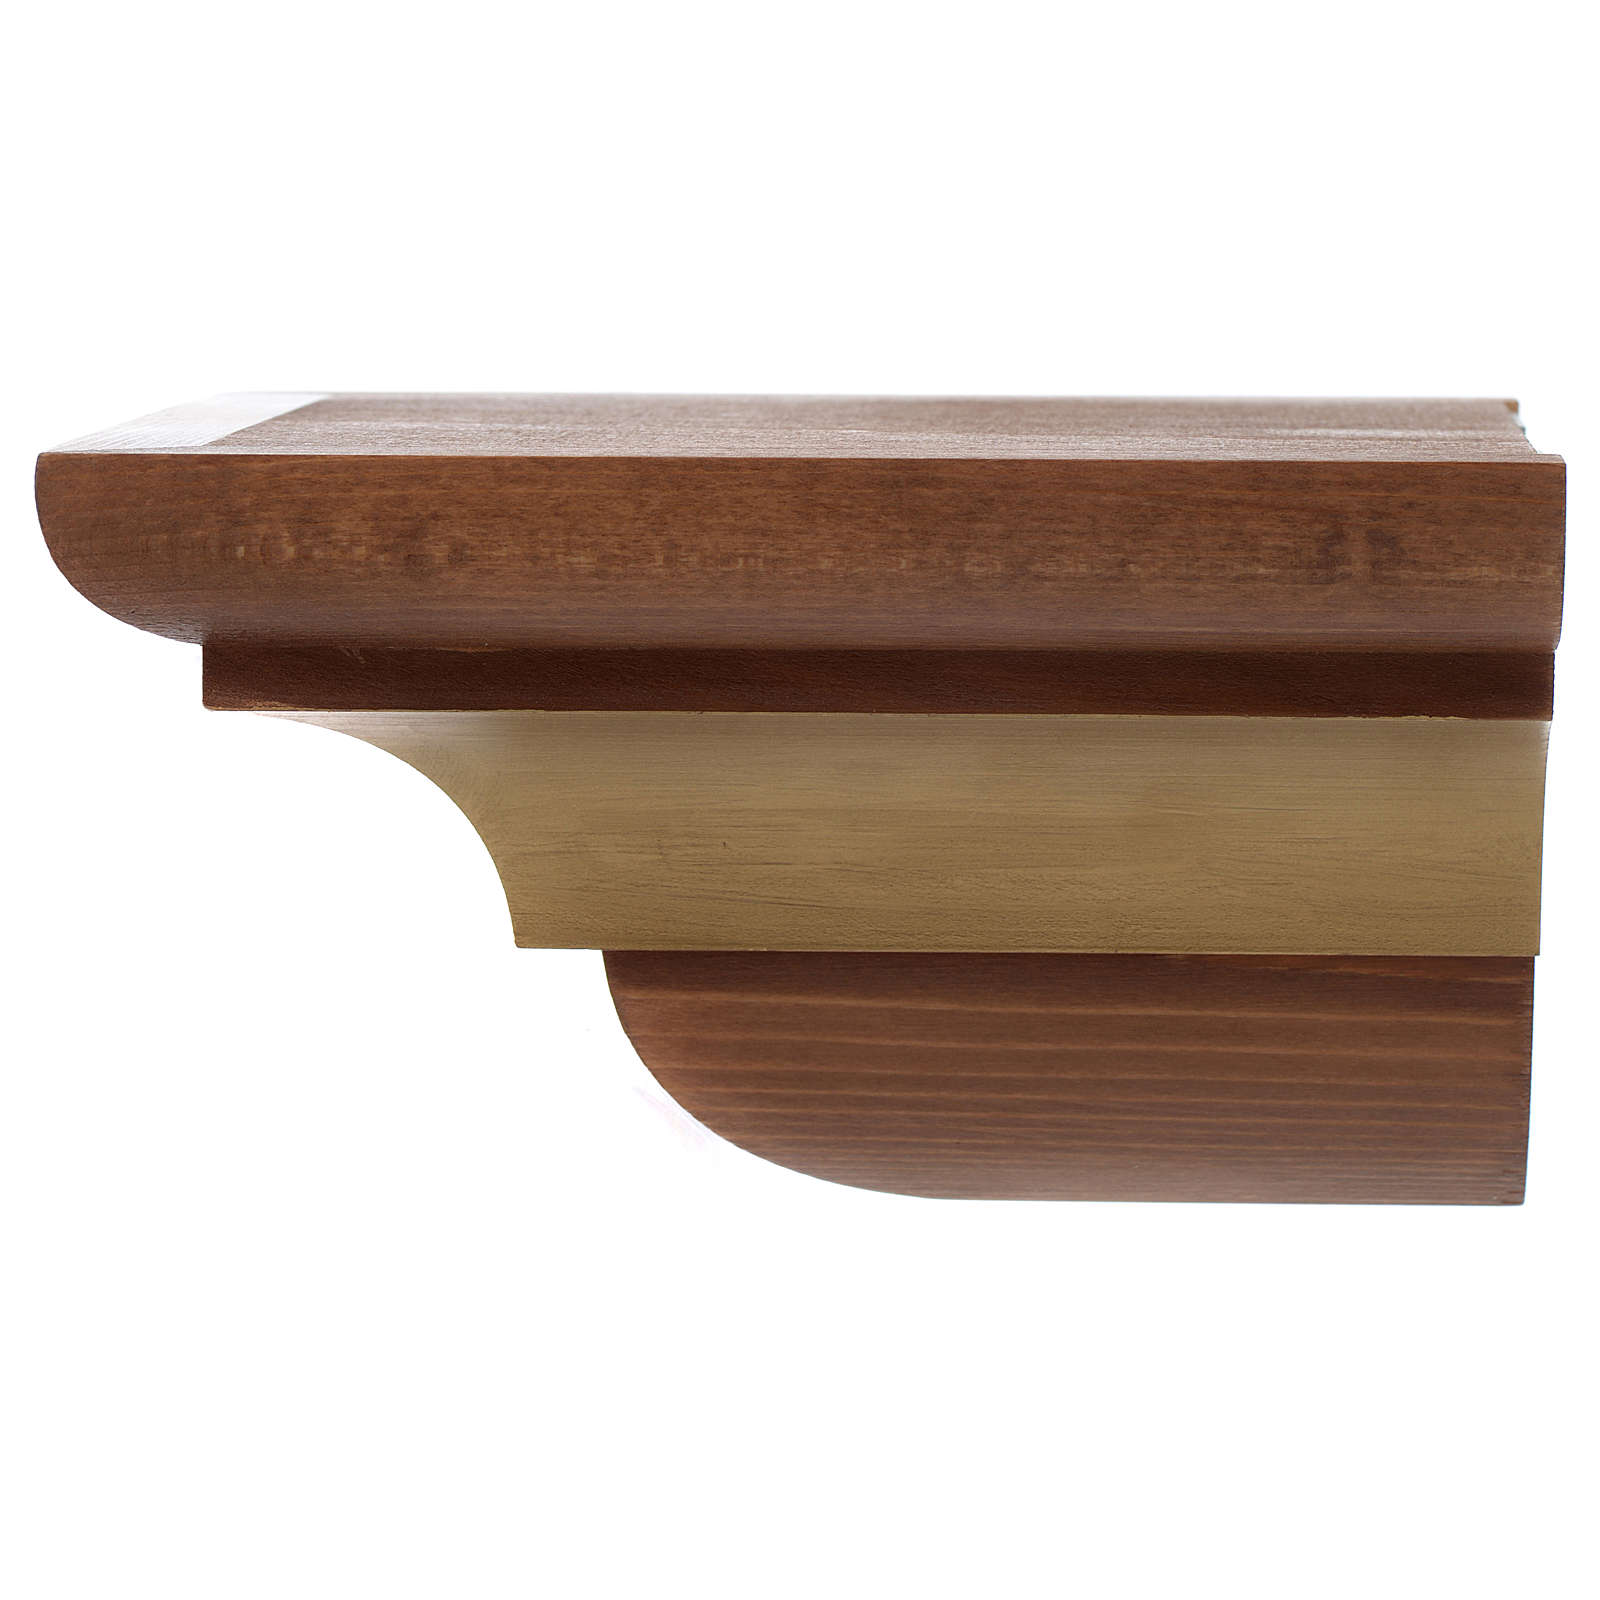 Ménsula madera Valgardena para pared estilo gótico 4